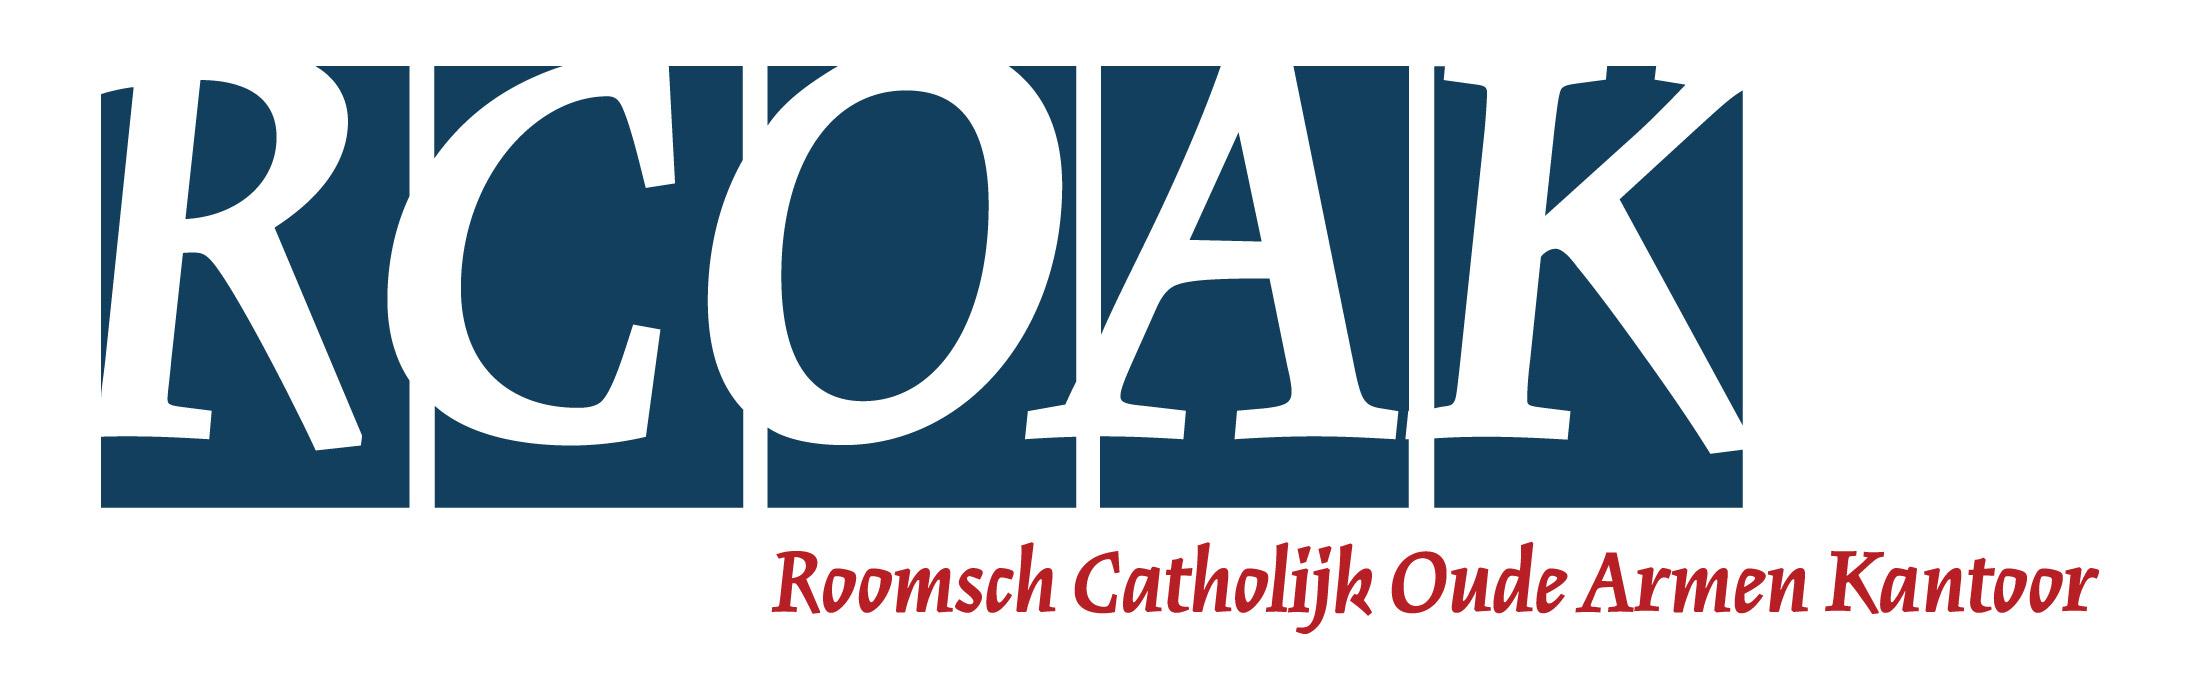 a108585574176a55d3dfd501ce975d1c.rcoak-logo